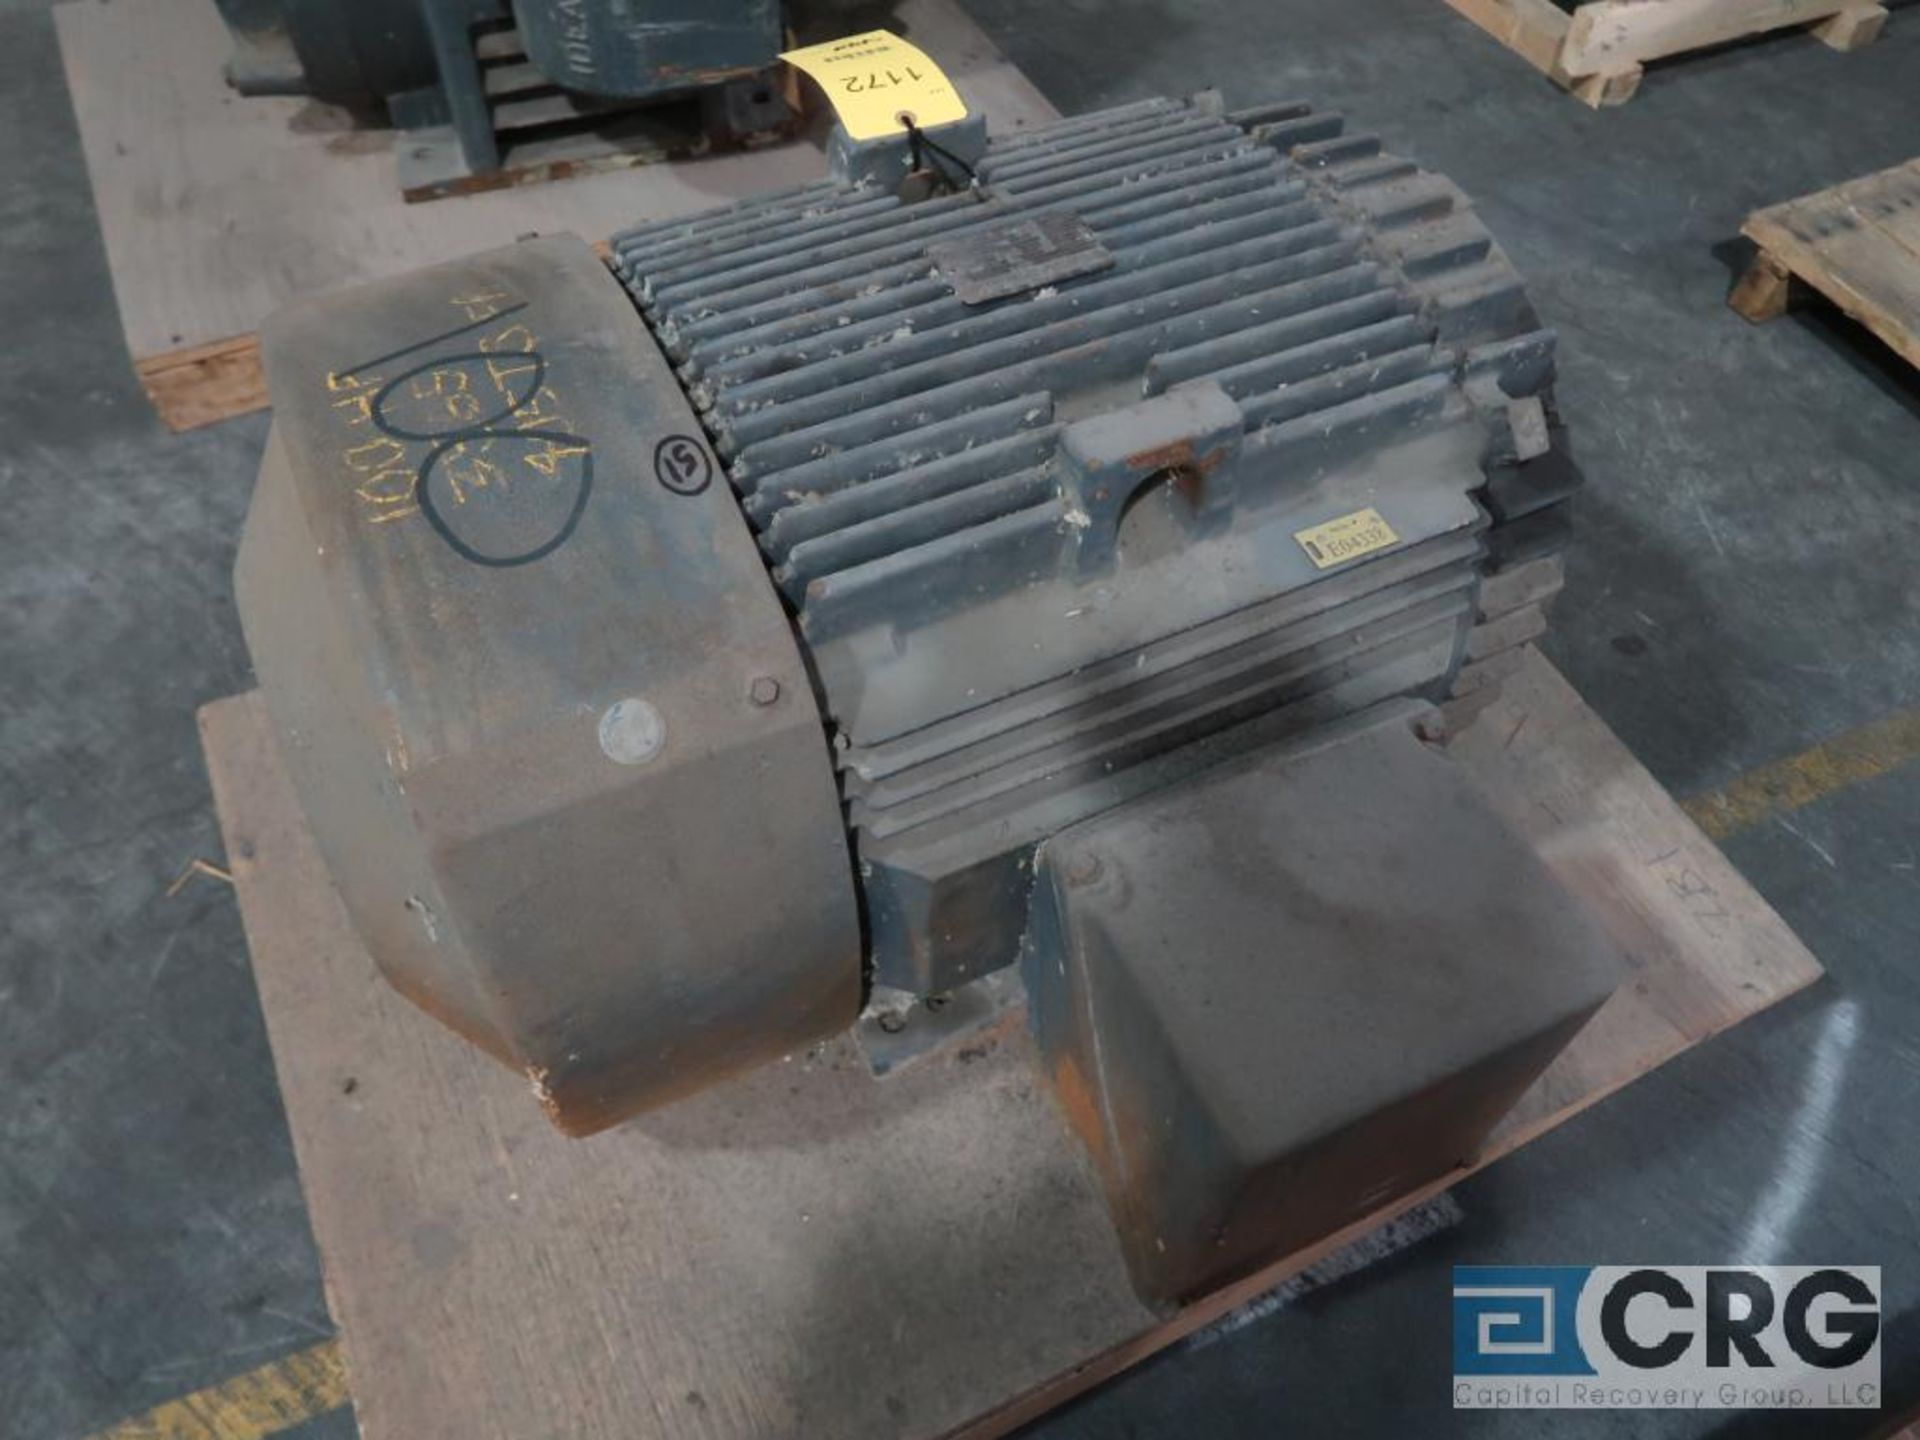 General Electric Severe Duty motor, 100 HP, 3,565 RPMs, 460 volt, 3 ph., 405TS frame (Finish